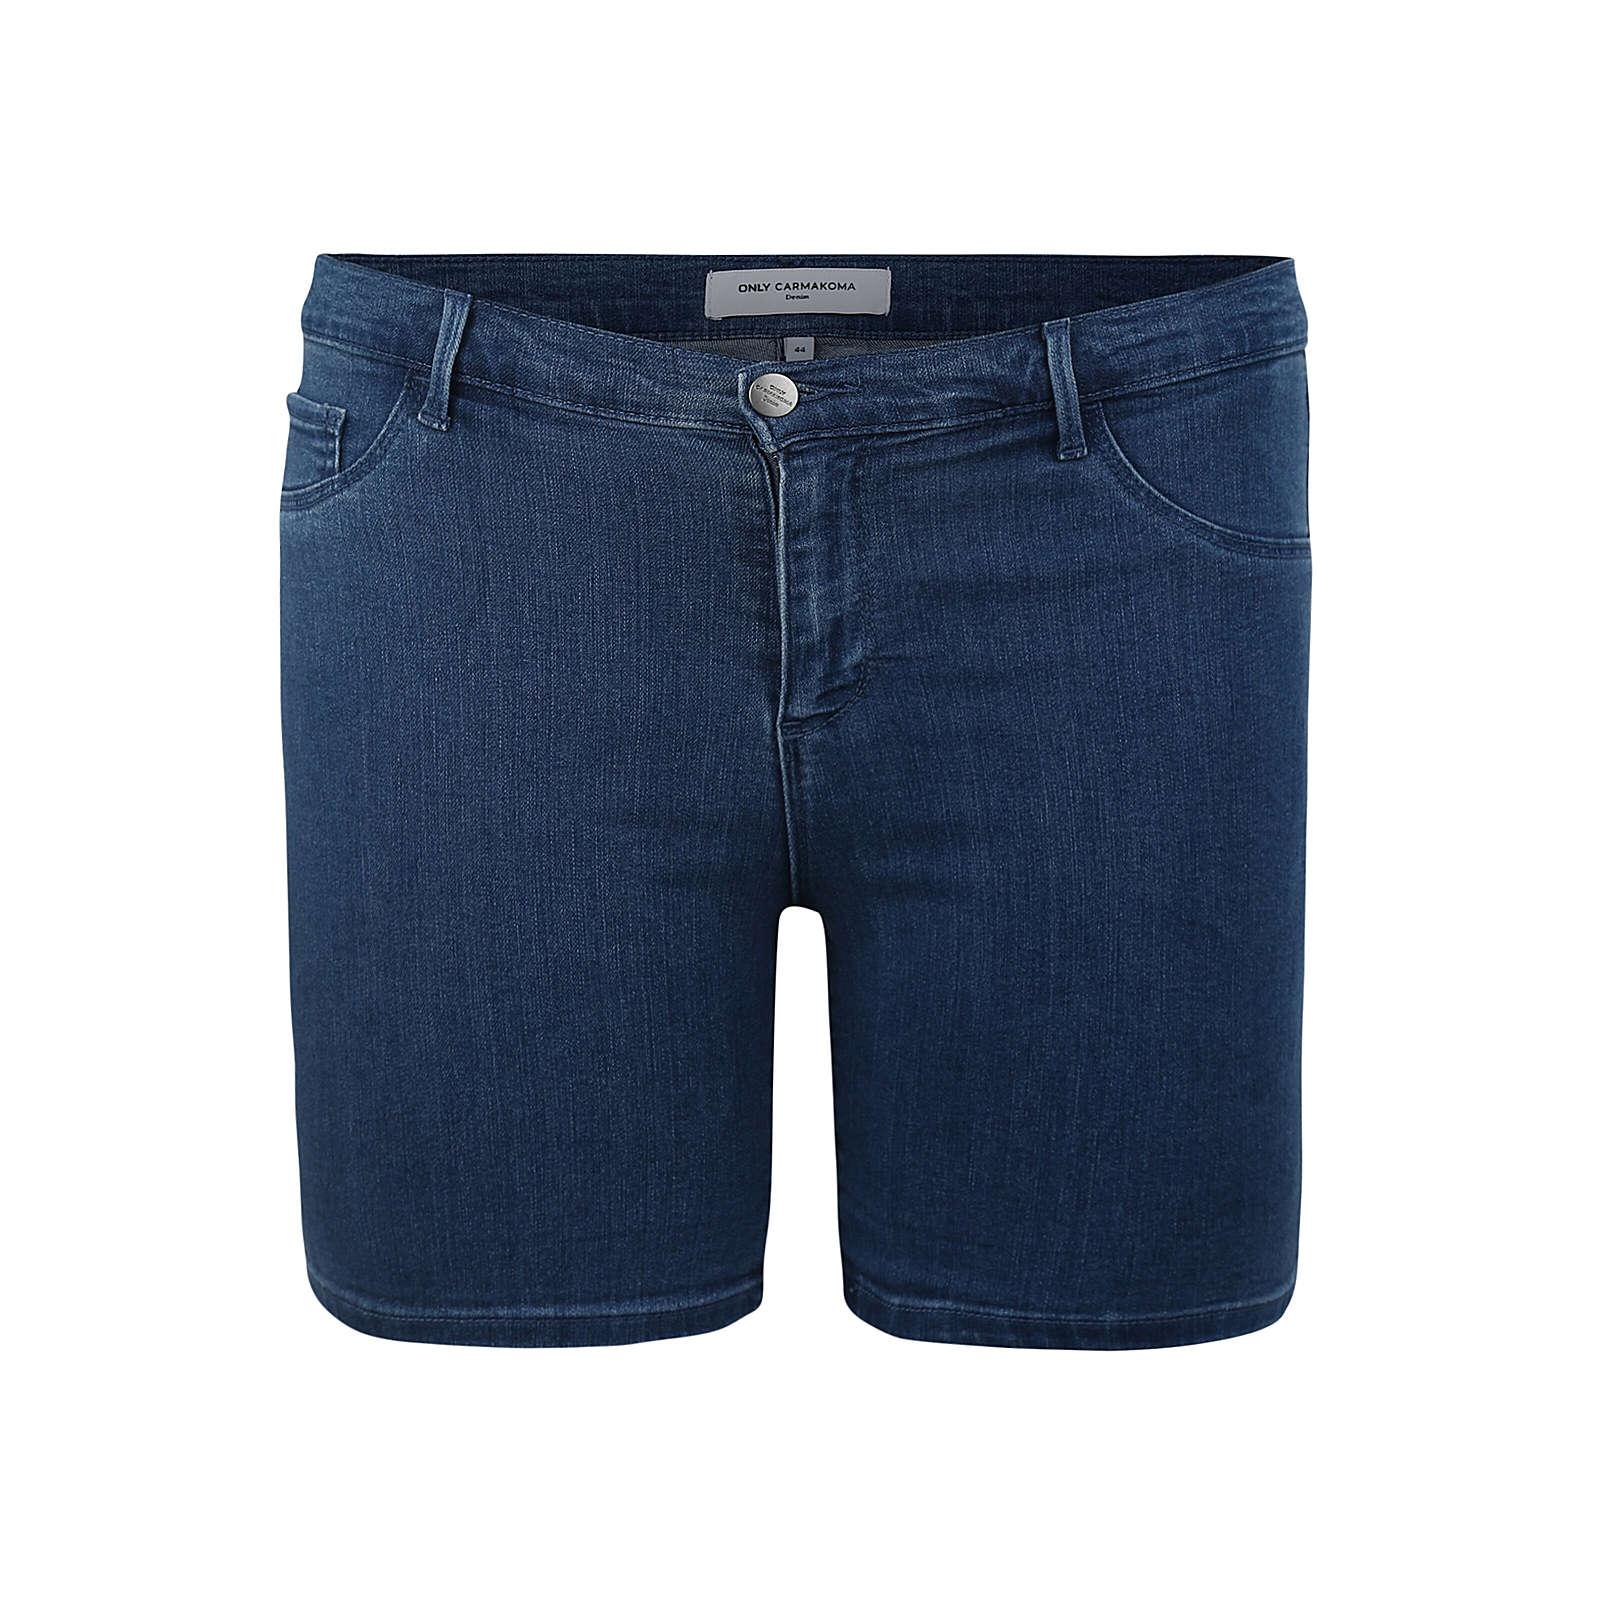 ONLY Carmakoma Hose Jeansshorts blau Damen Gr. 44